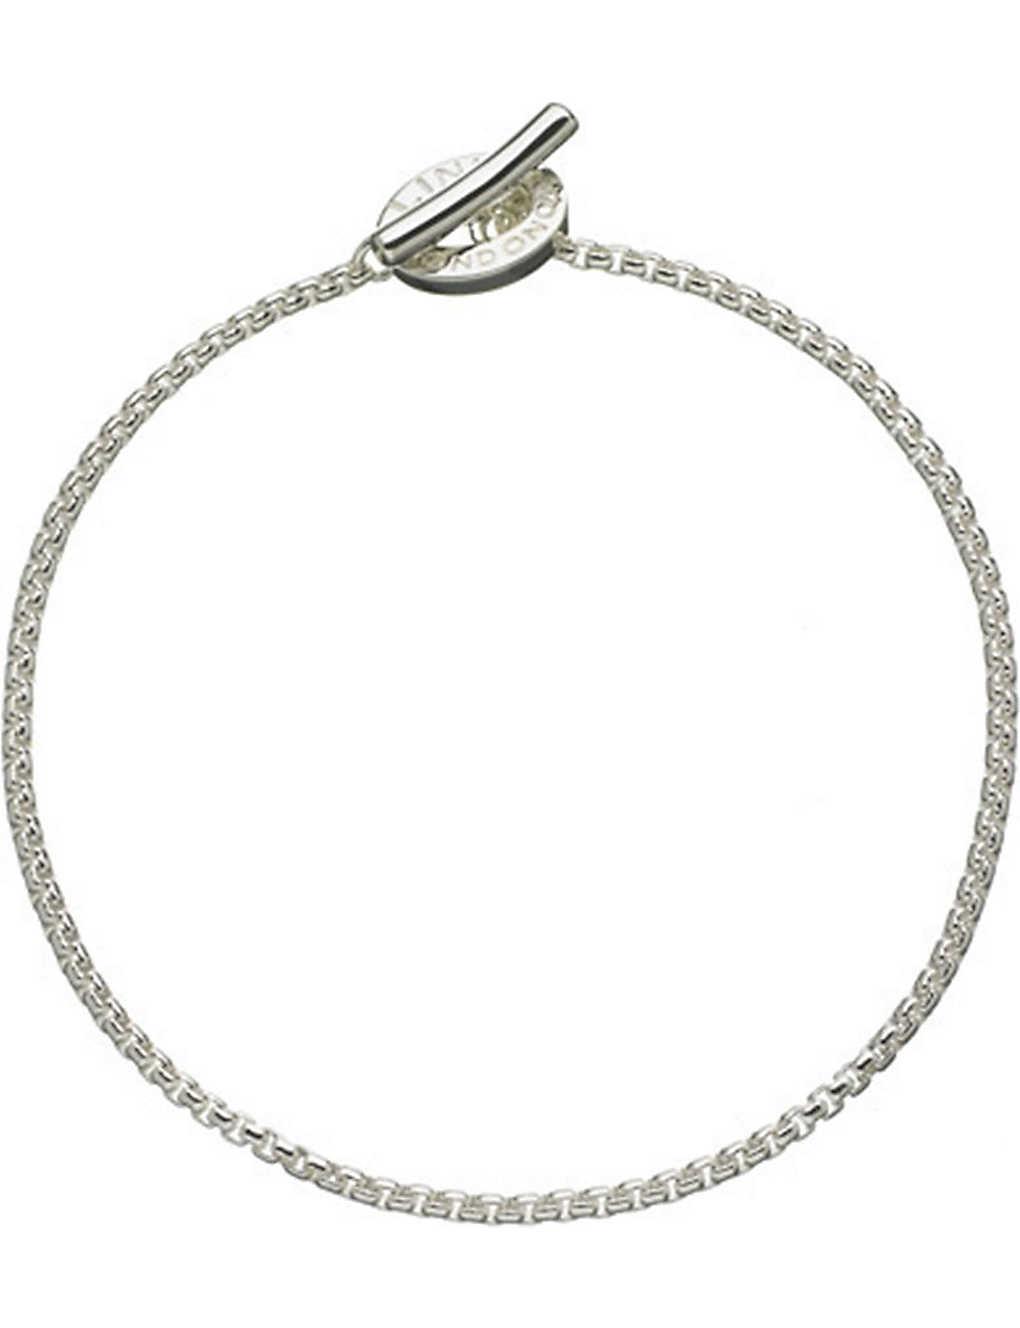 bbb3057b962e6 LINKS OF LONDON - Sterling silver box belcher bracelet